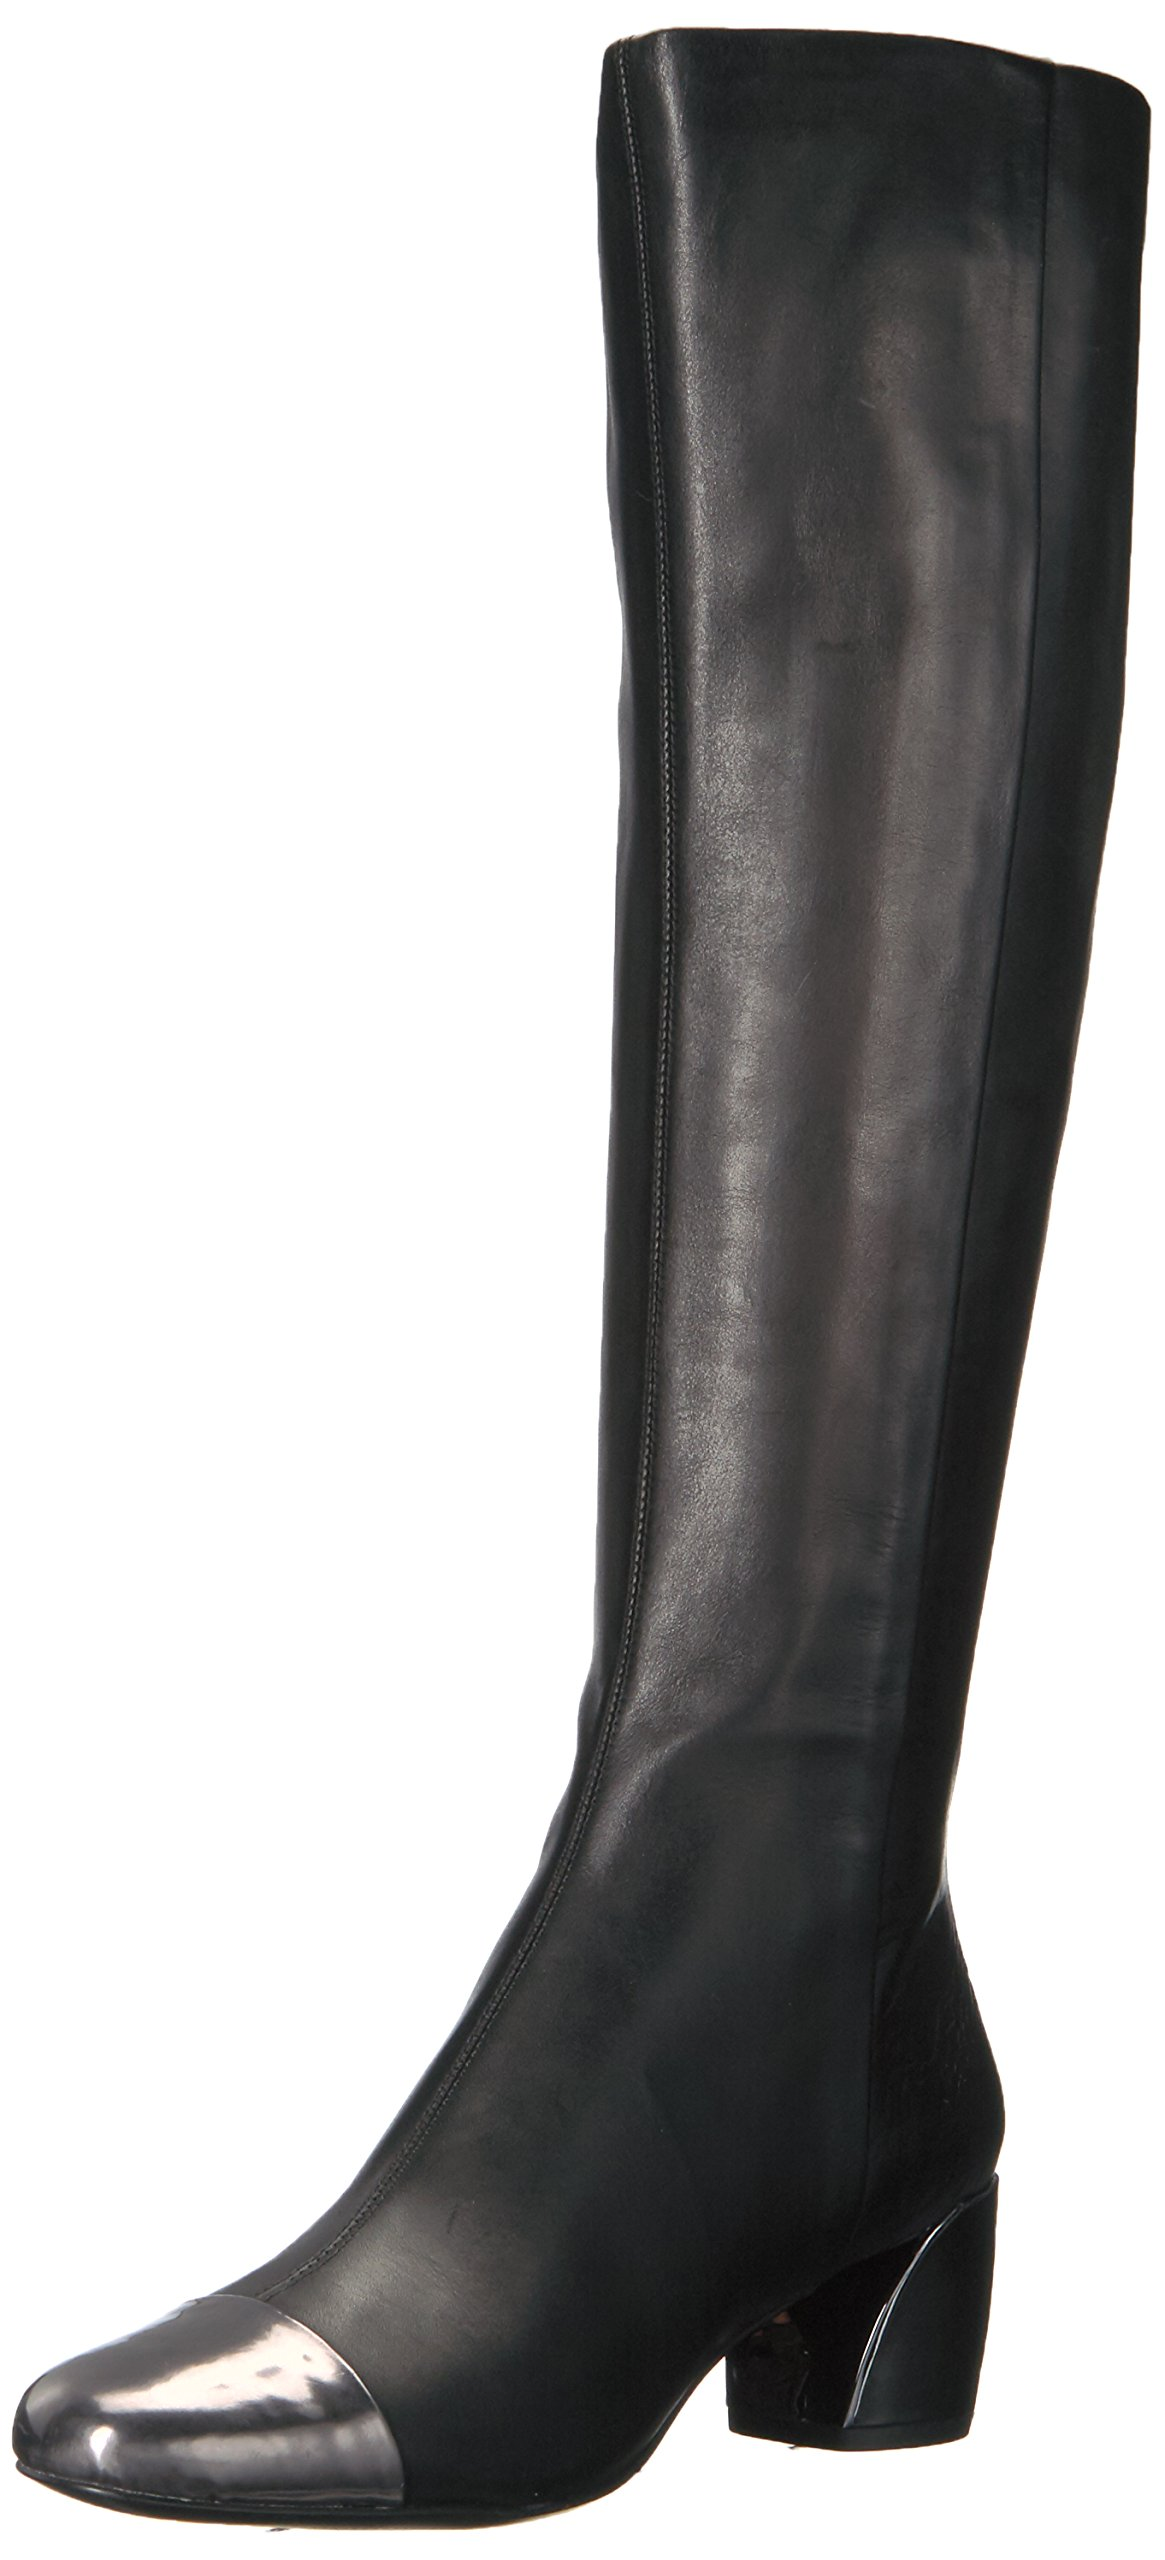 Nine West Women's Jatoba Knee High Boot, Black/Pewter, 6.5 Medium US